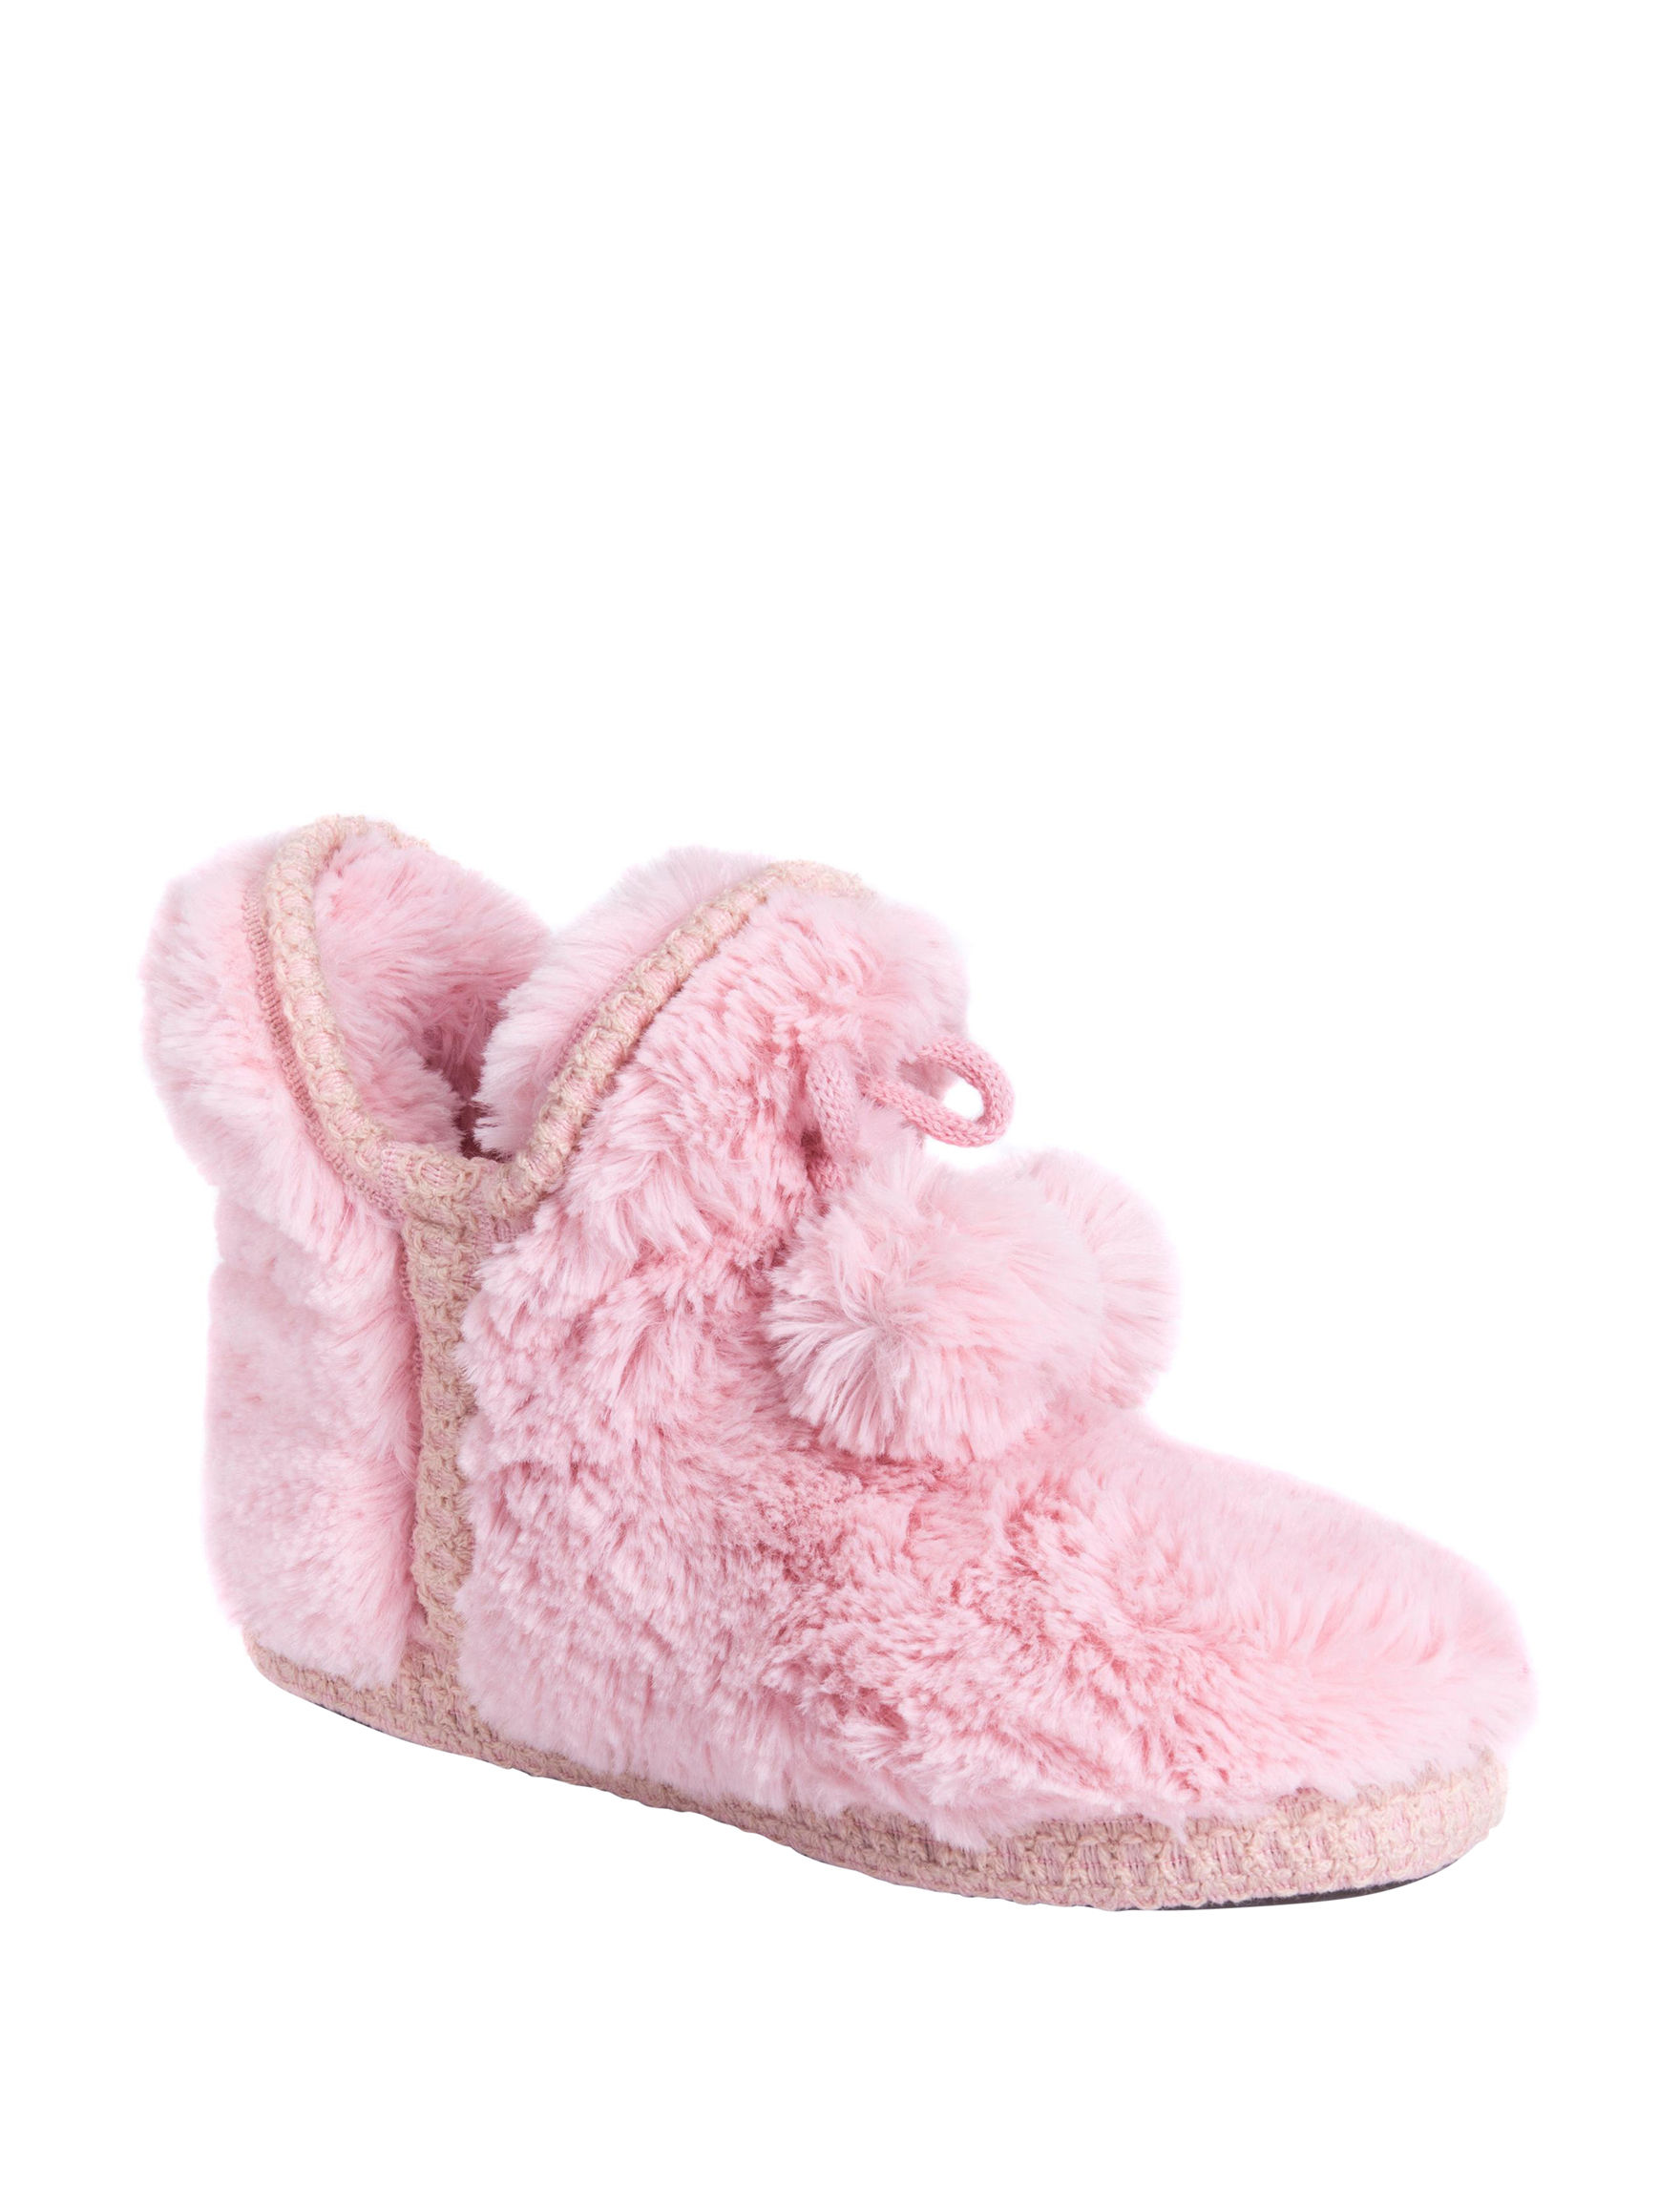 Muk Luks Pink Slipper Boots & Booties